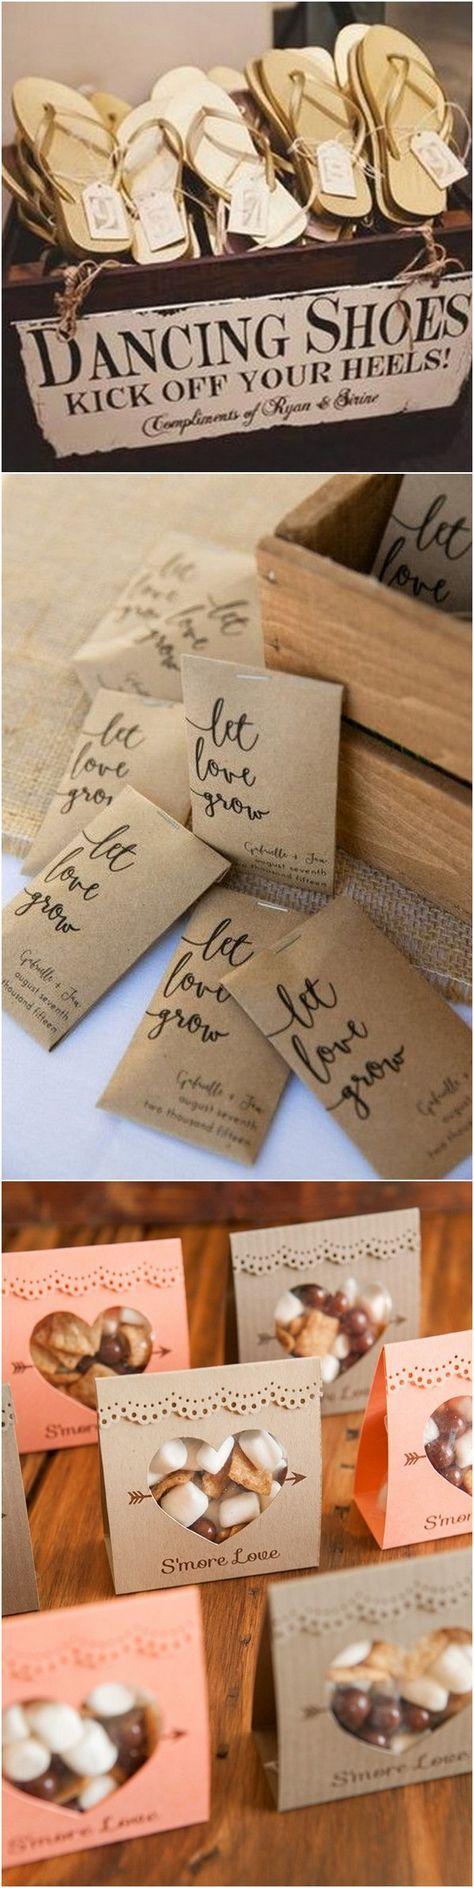 creative wedding favor ideas